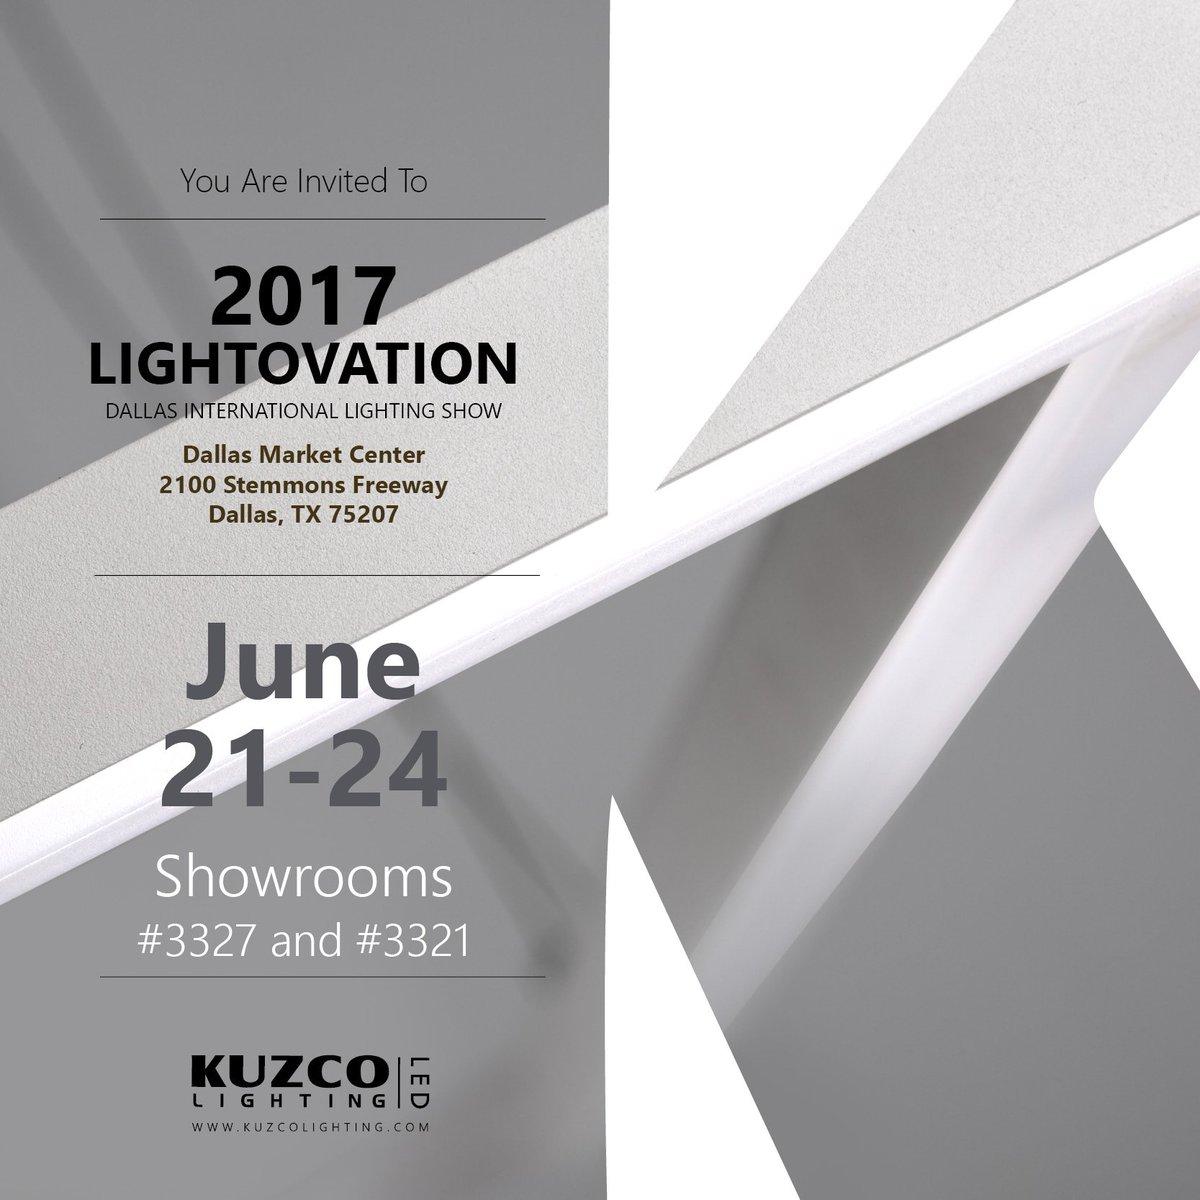 kuzco lighting on twitter see you at lightovation dallasmarket